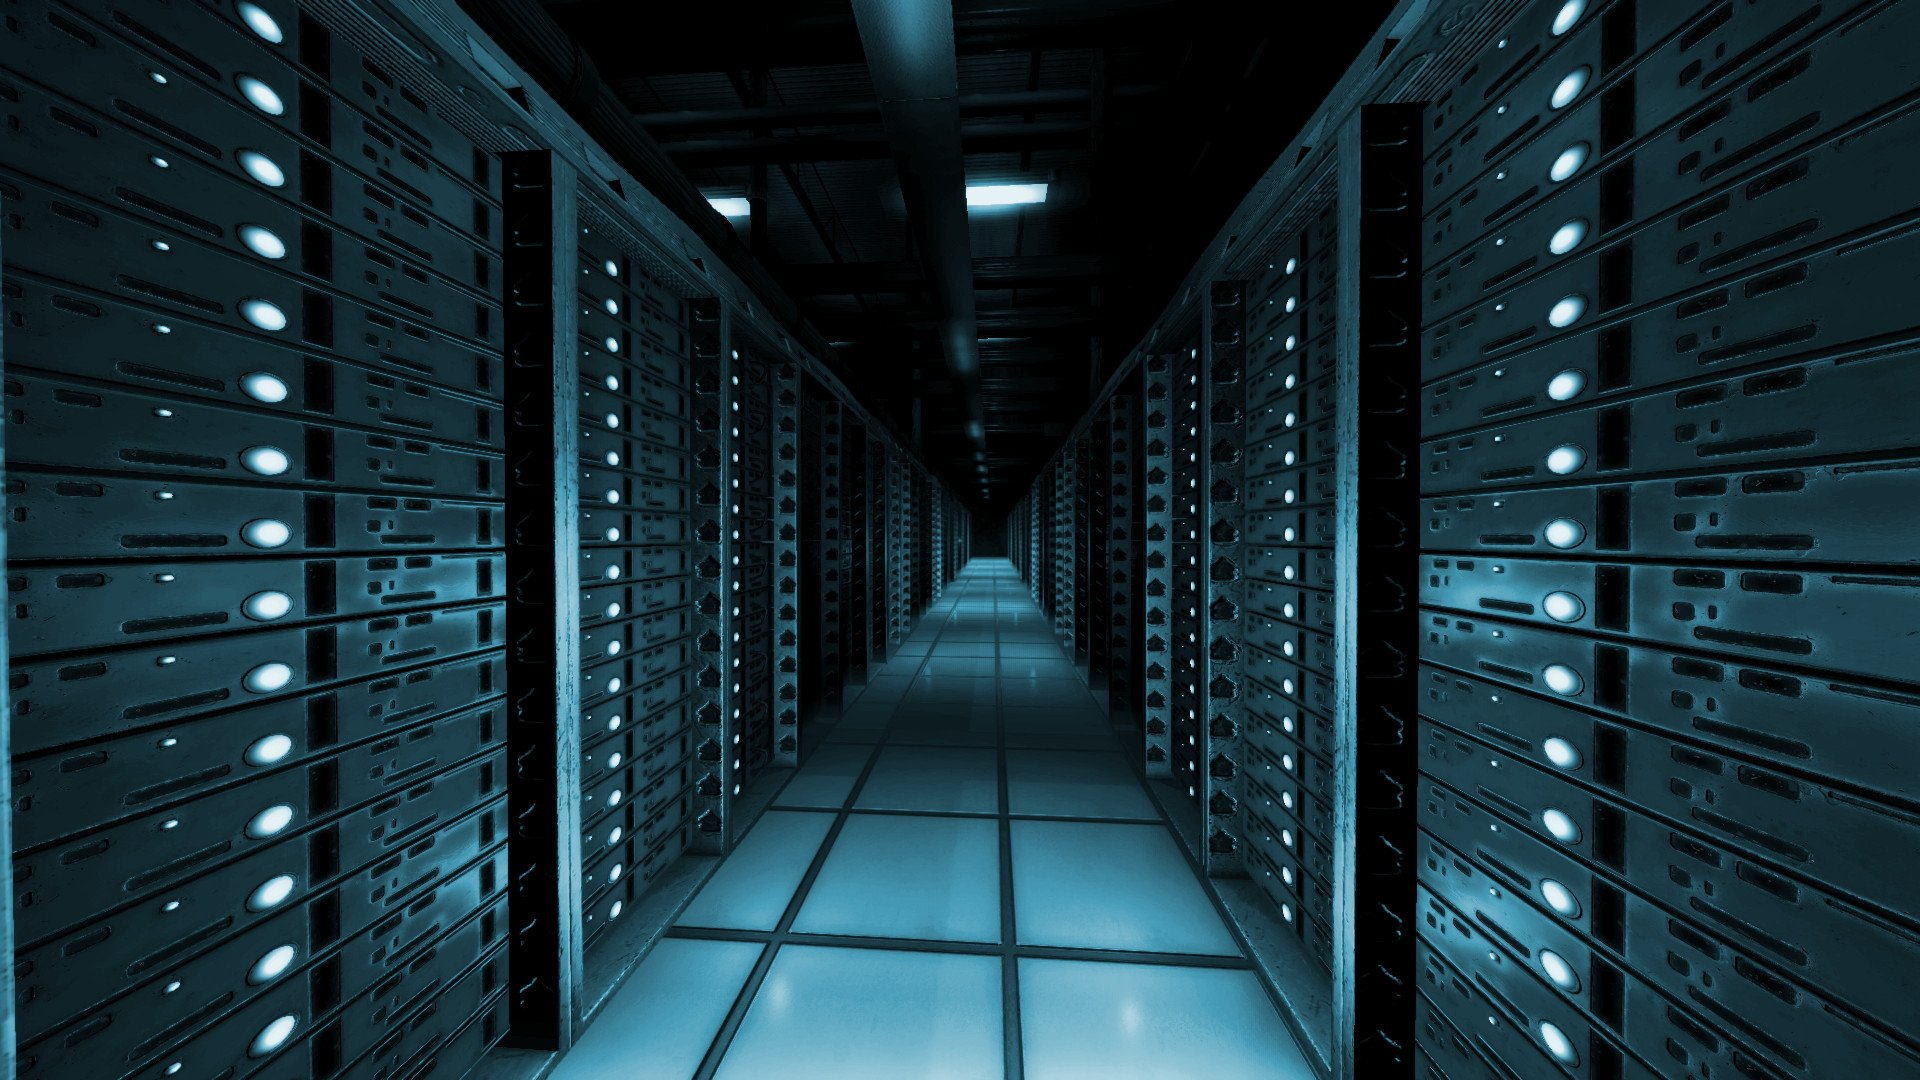 Server Room Photography : Data center wallpaper wallpapersafari